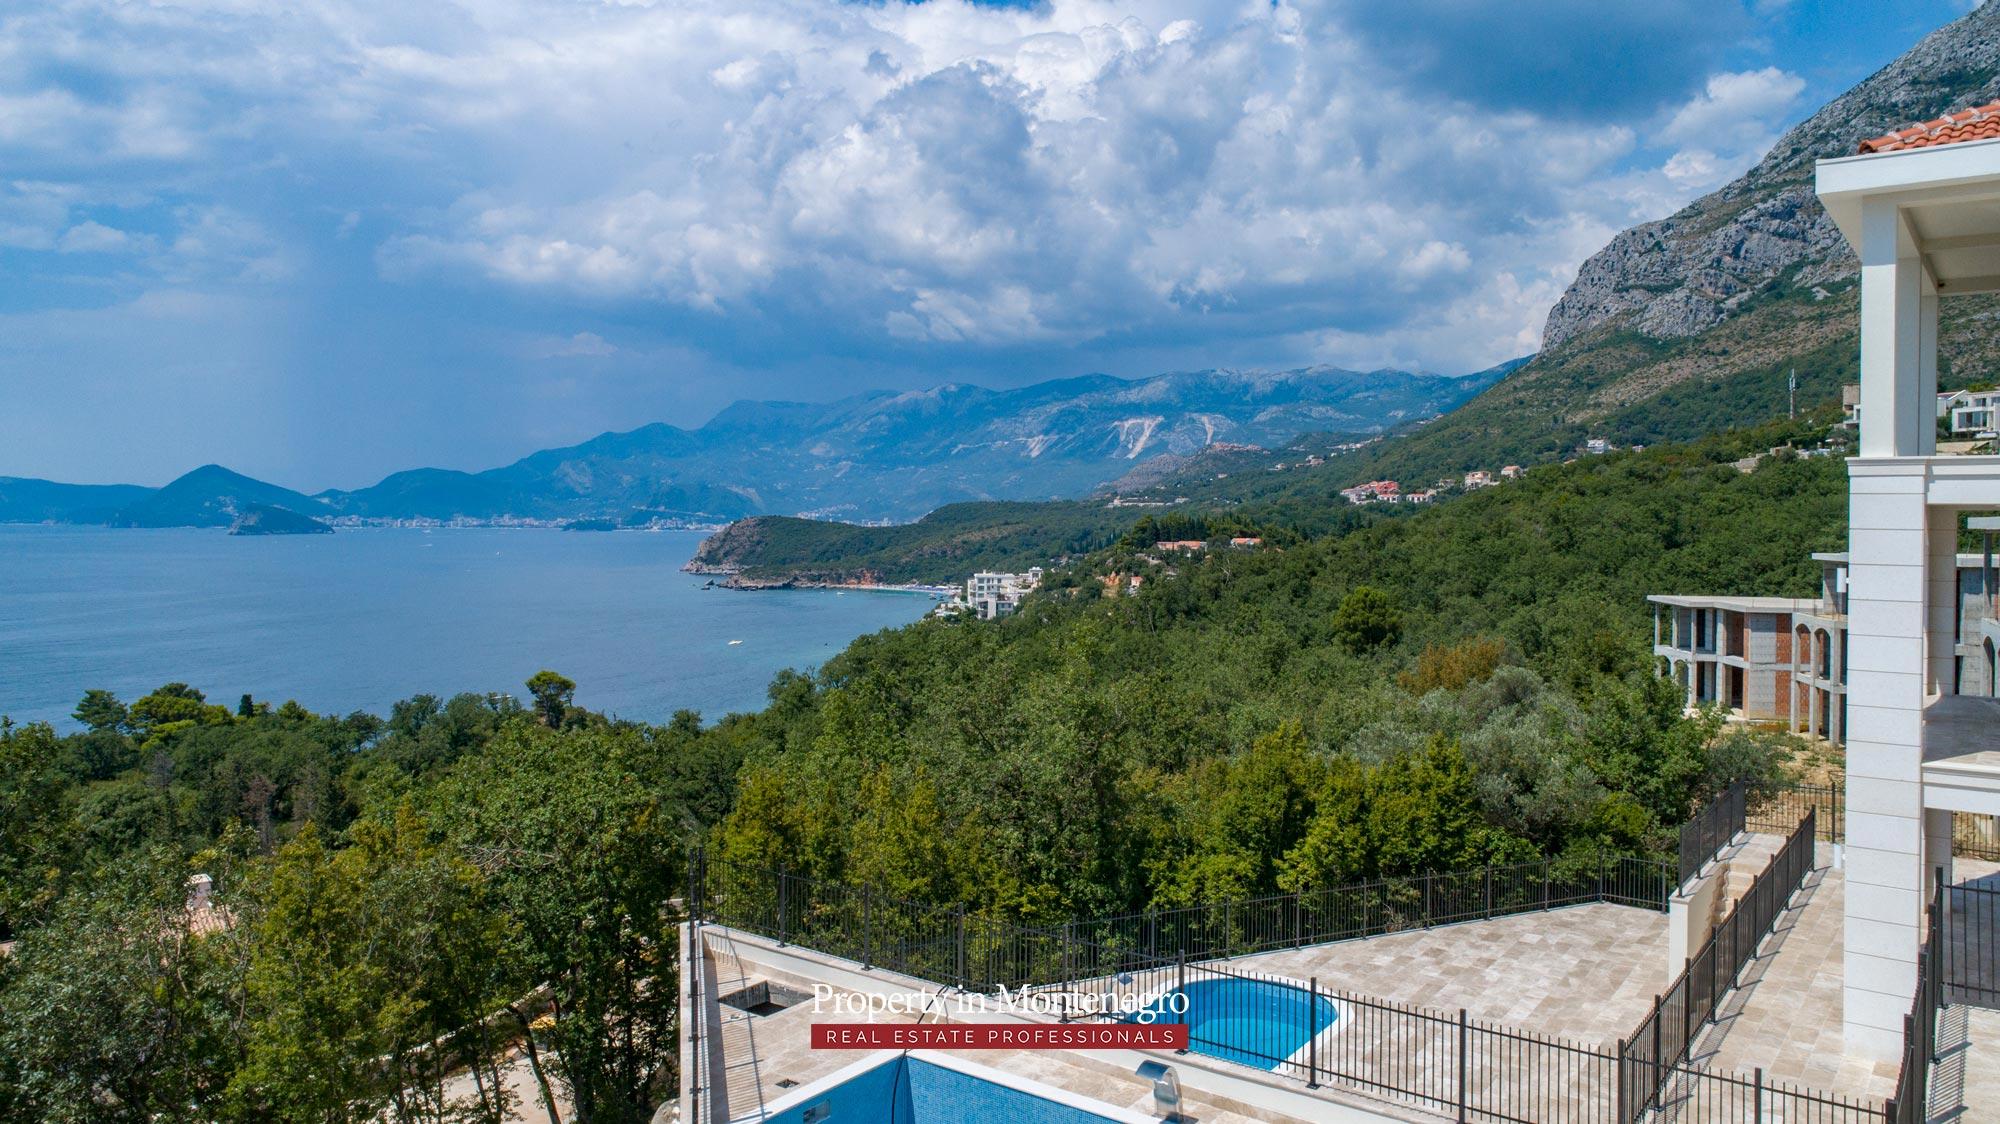 Luxury-apartment-for-sale-in-Budva (7).jpg